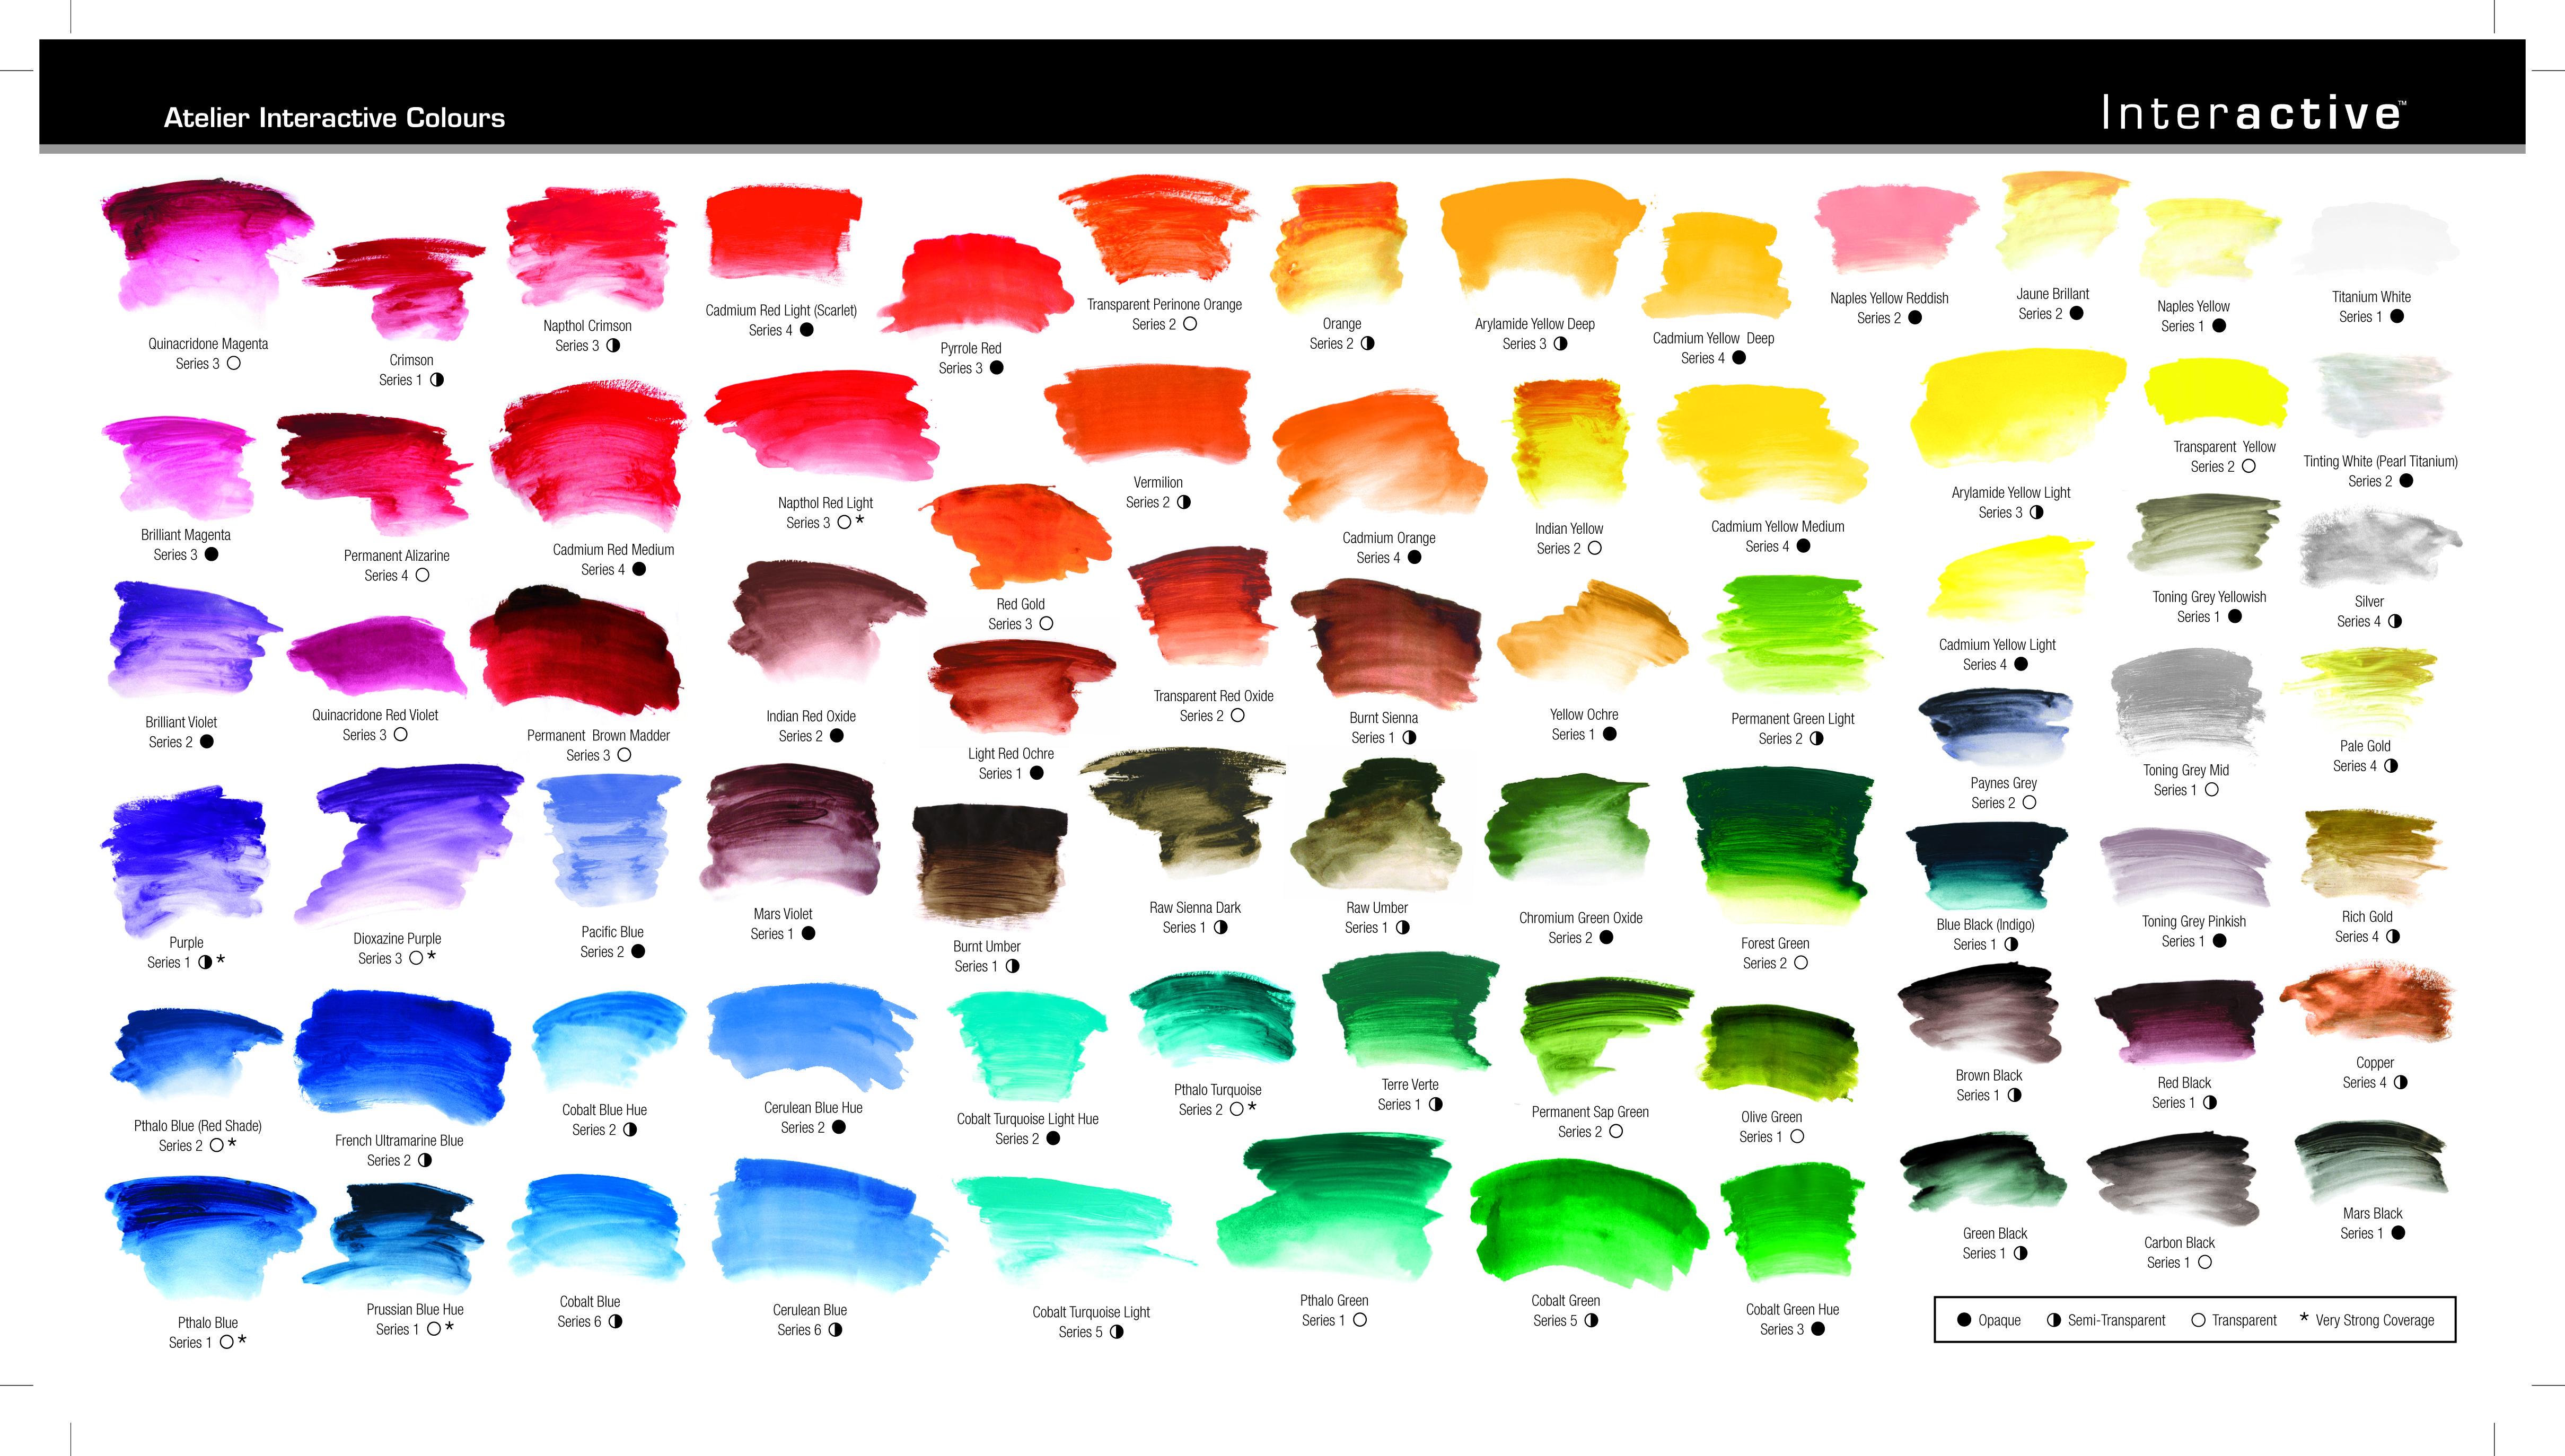 atelier interactive color chart atelier interactive pinterest